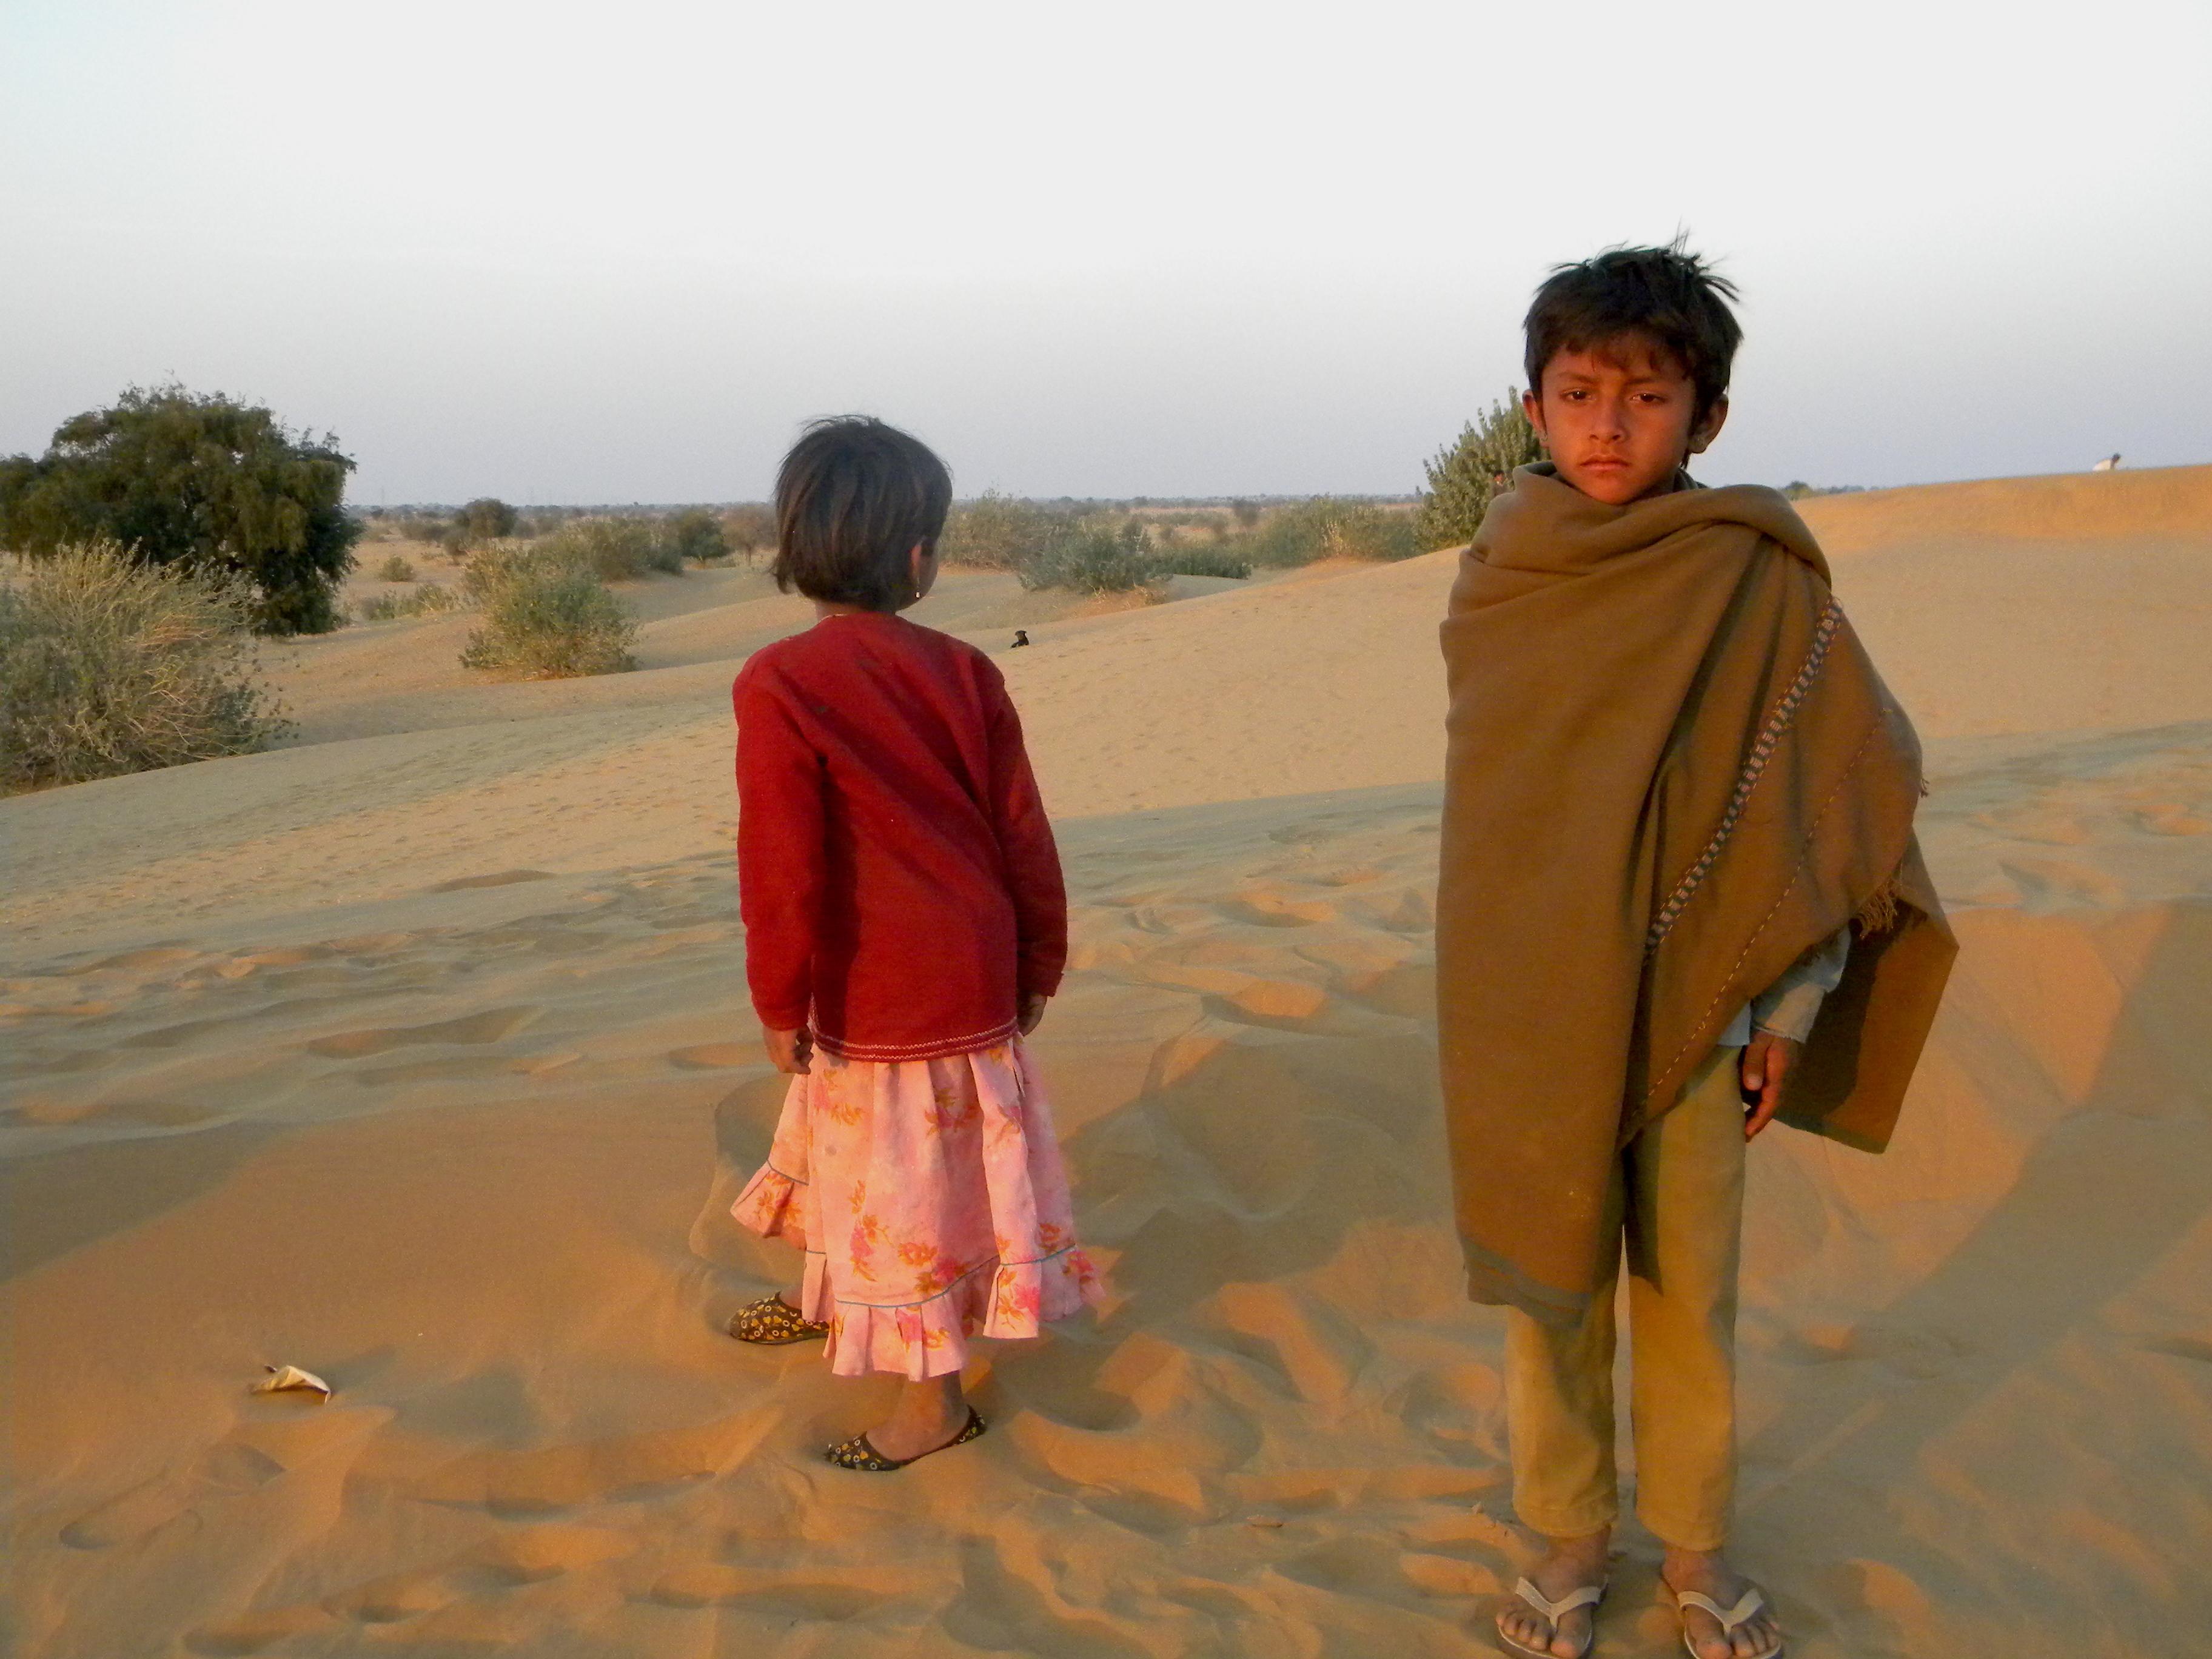 Siblings, India 2010